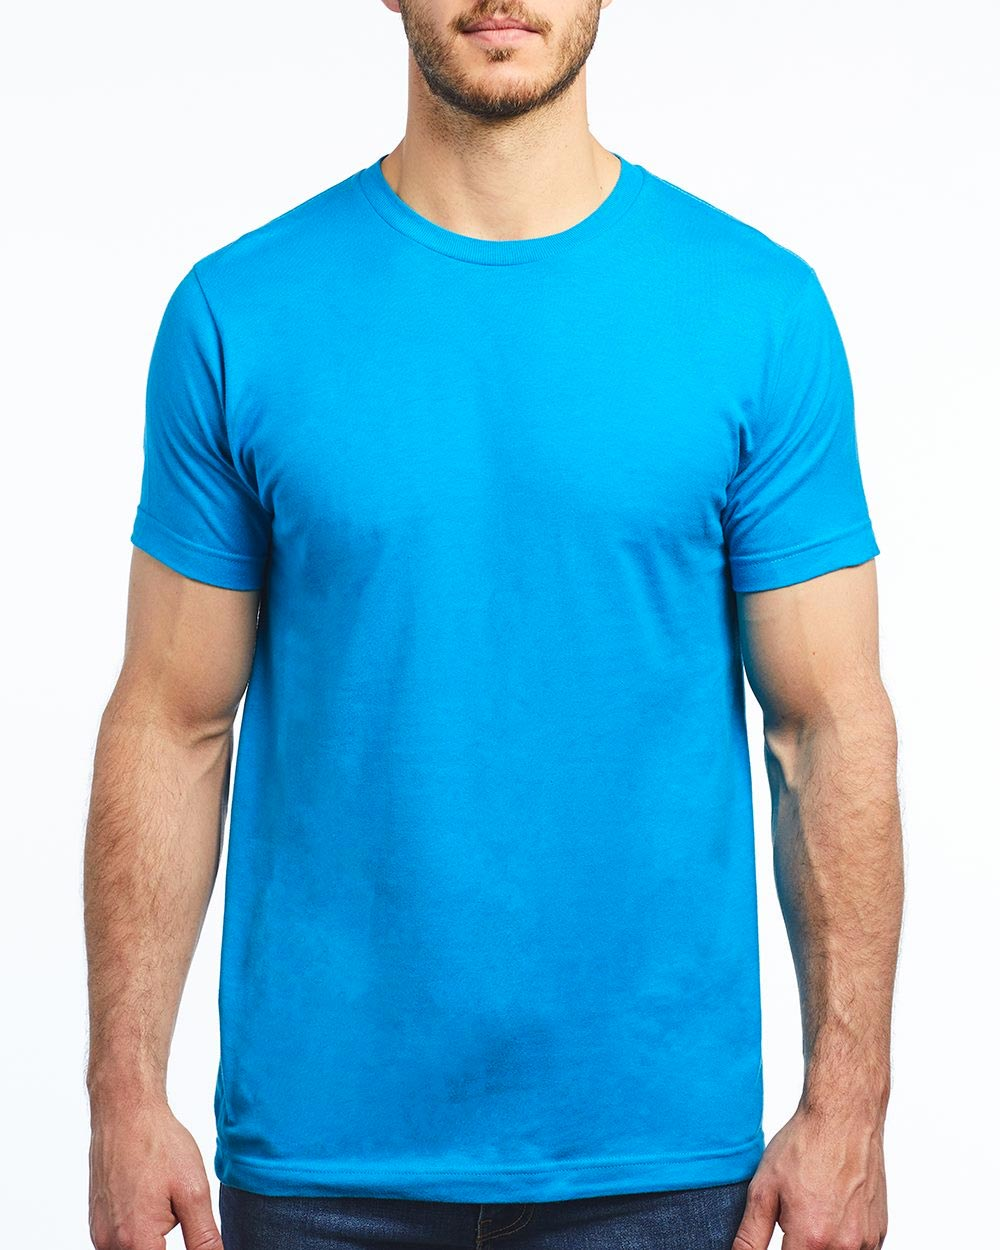 M&O Knits 4502 - Fine Jersy T-Shirt